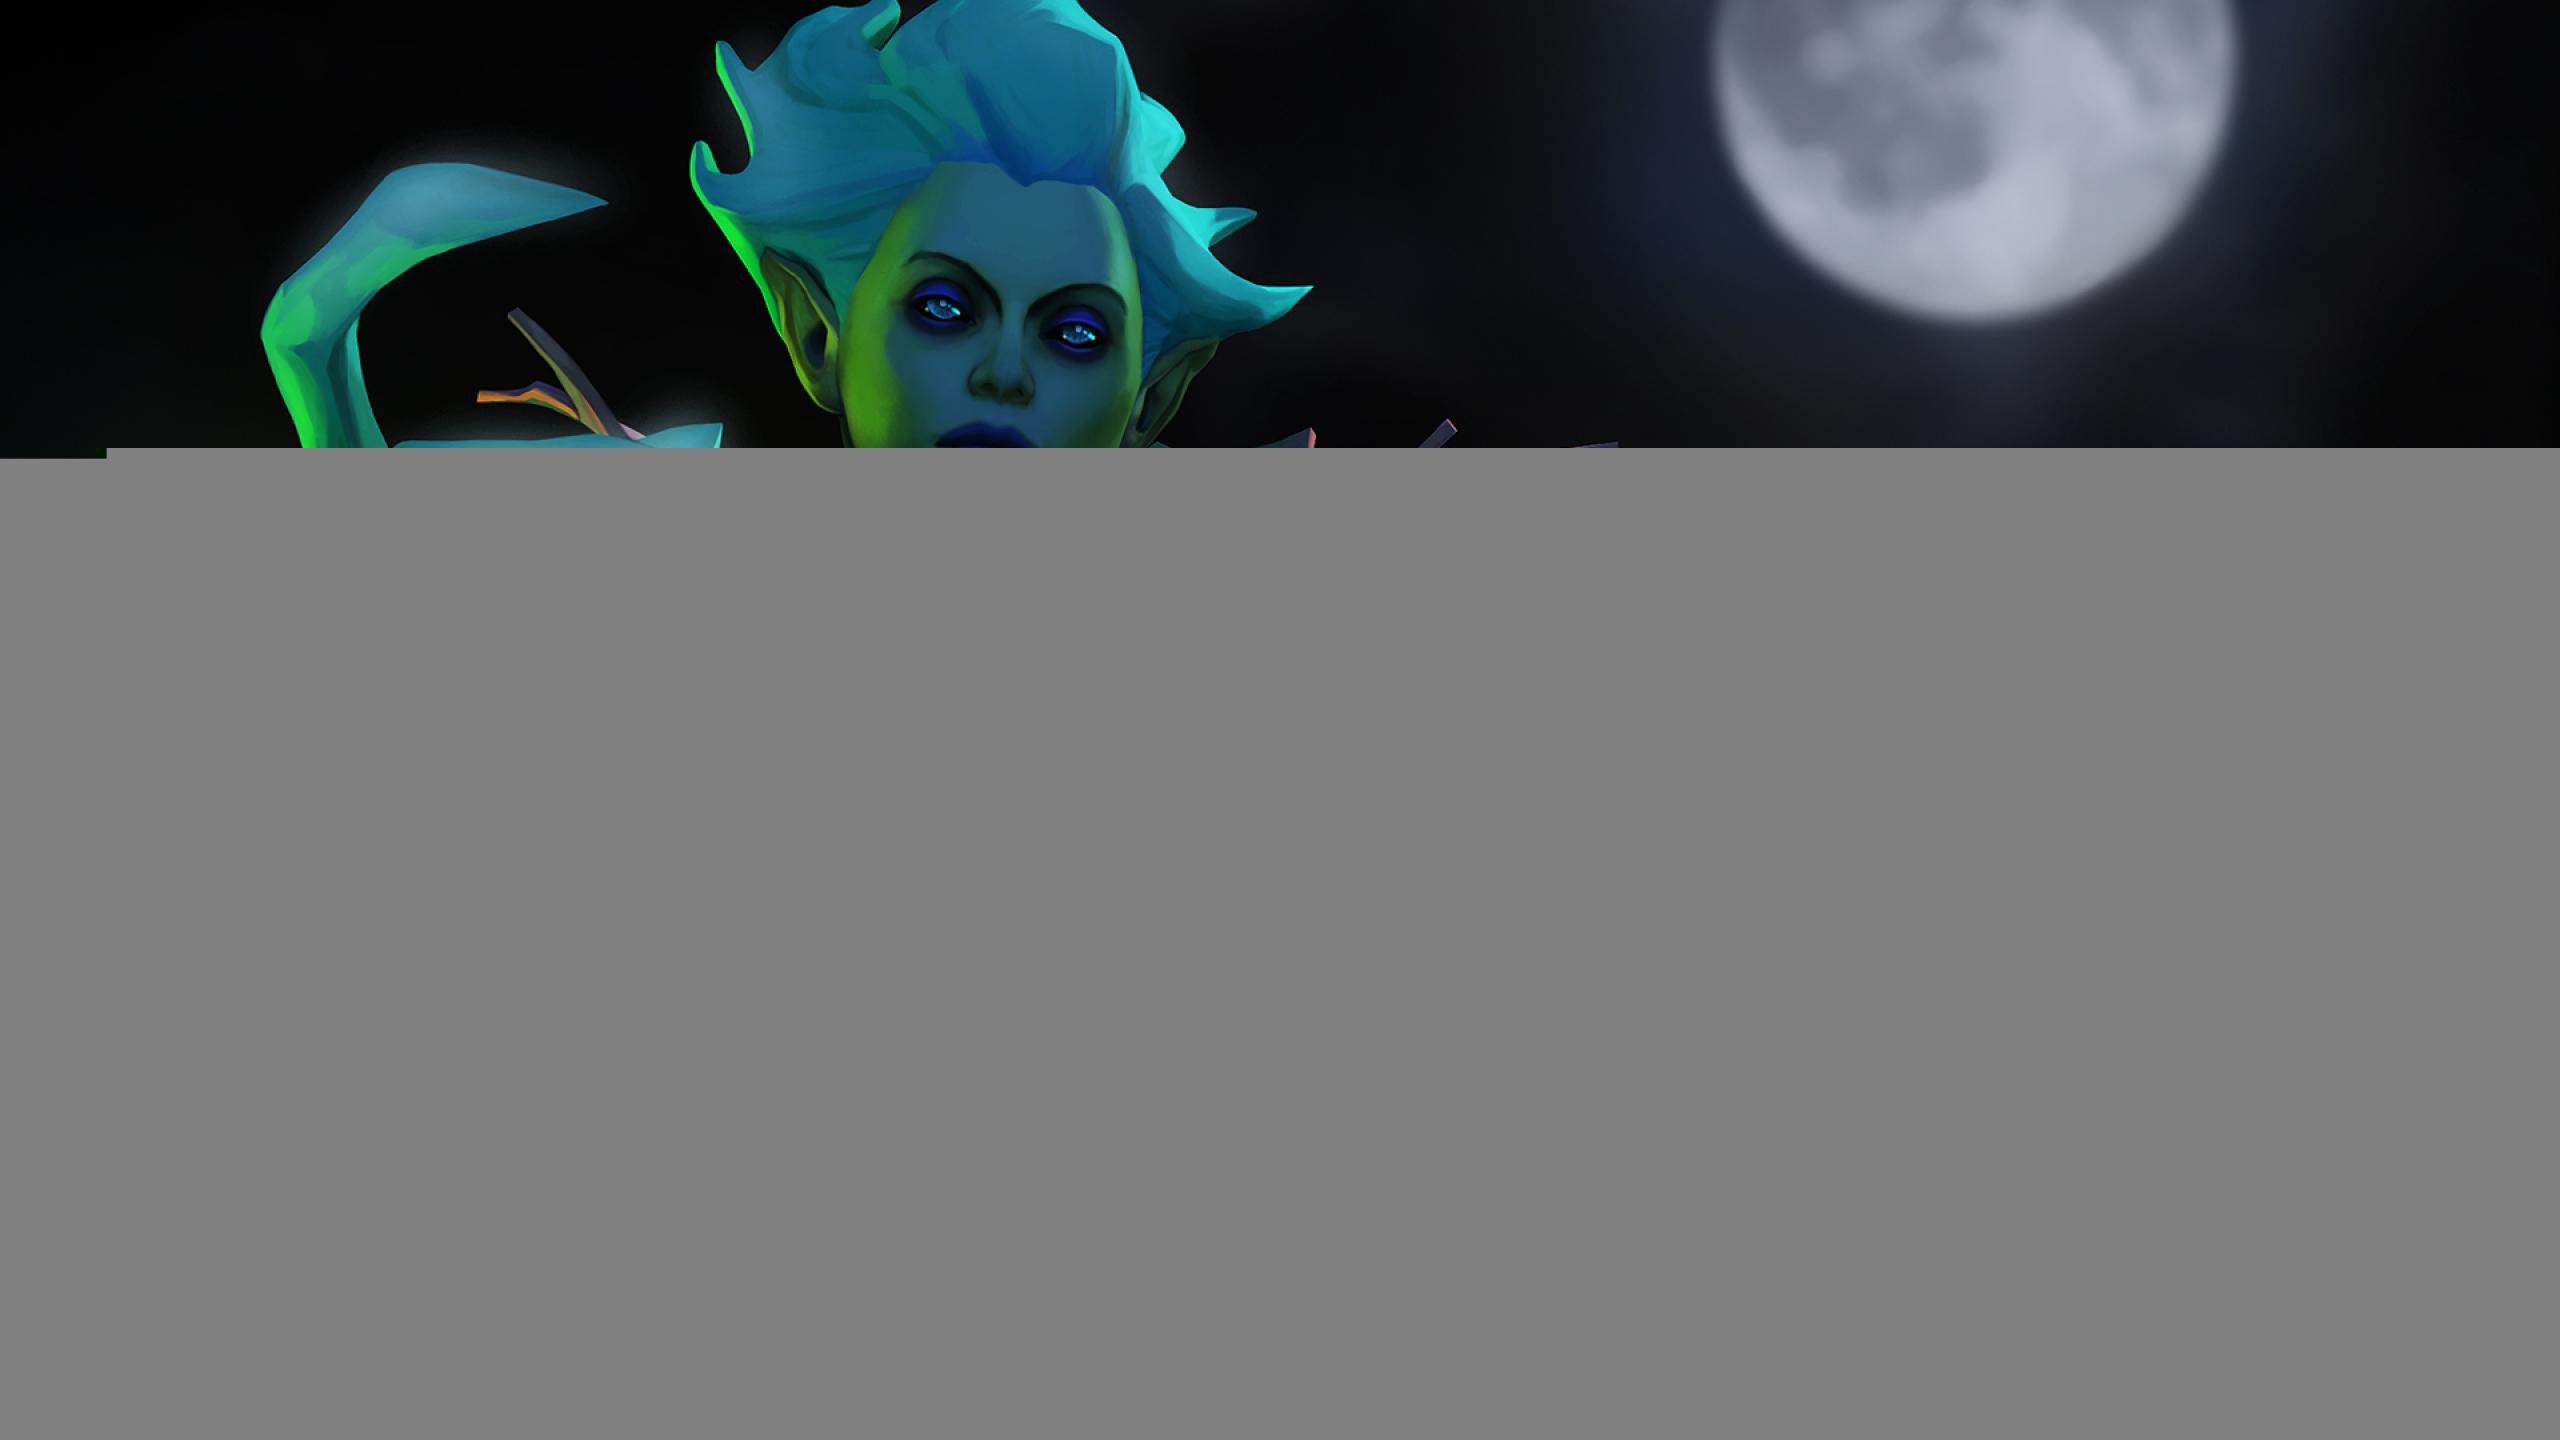 2560x1440 Krobelus Death Prophet Dota 2 1440p Resolution